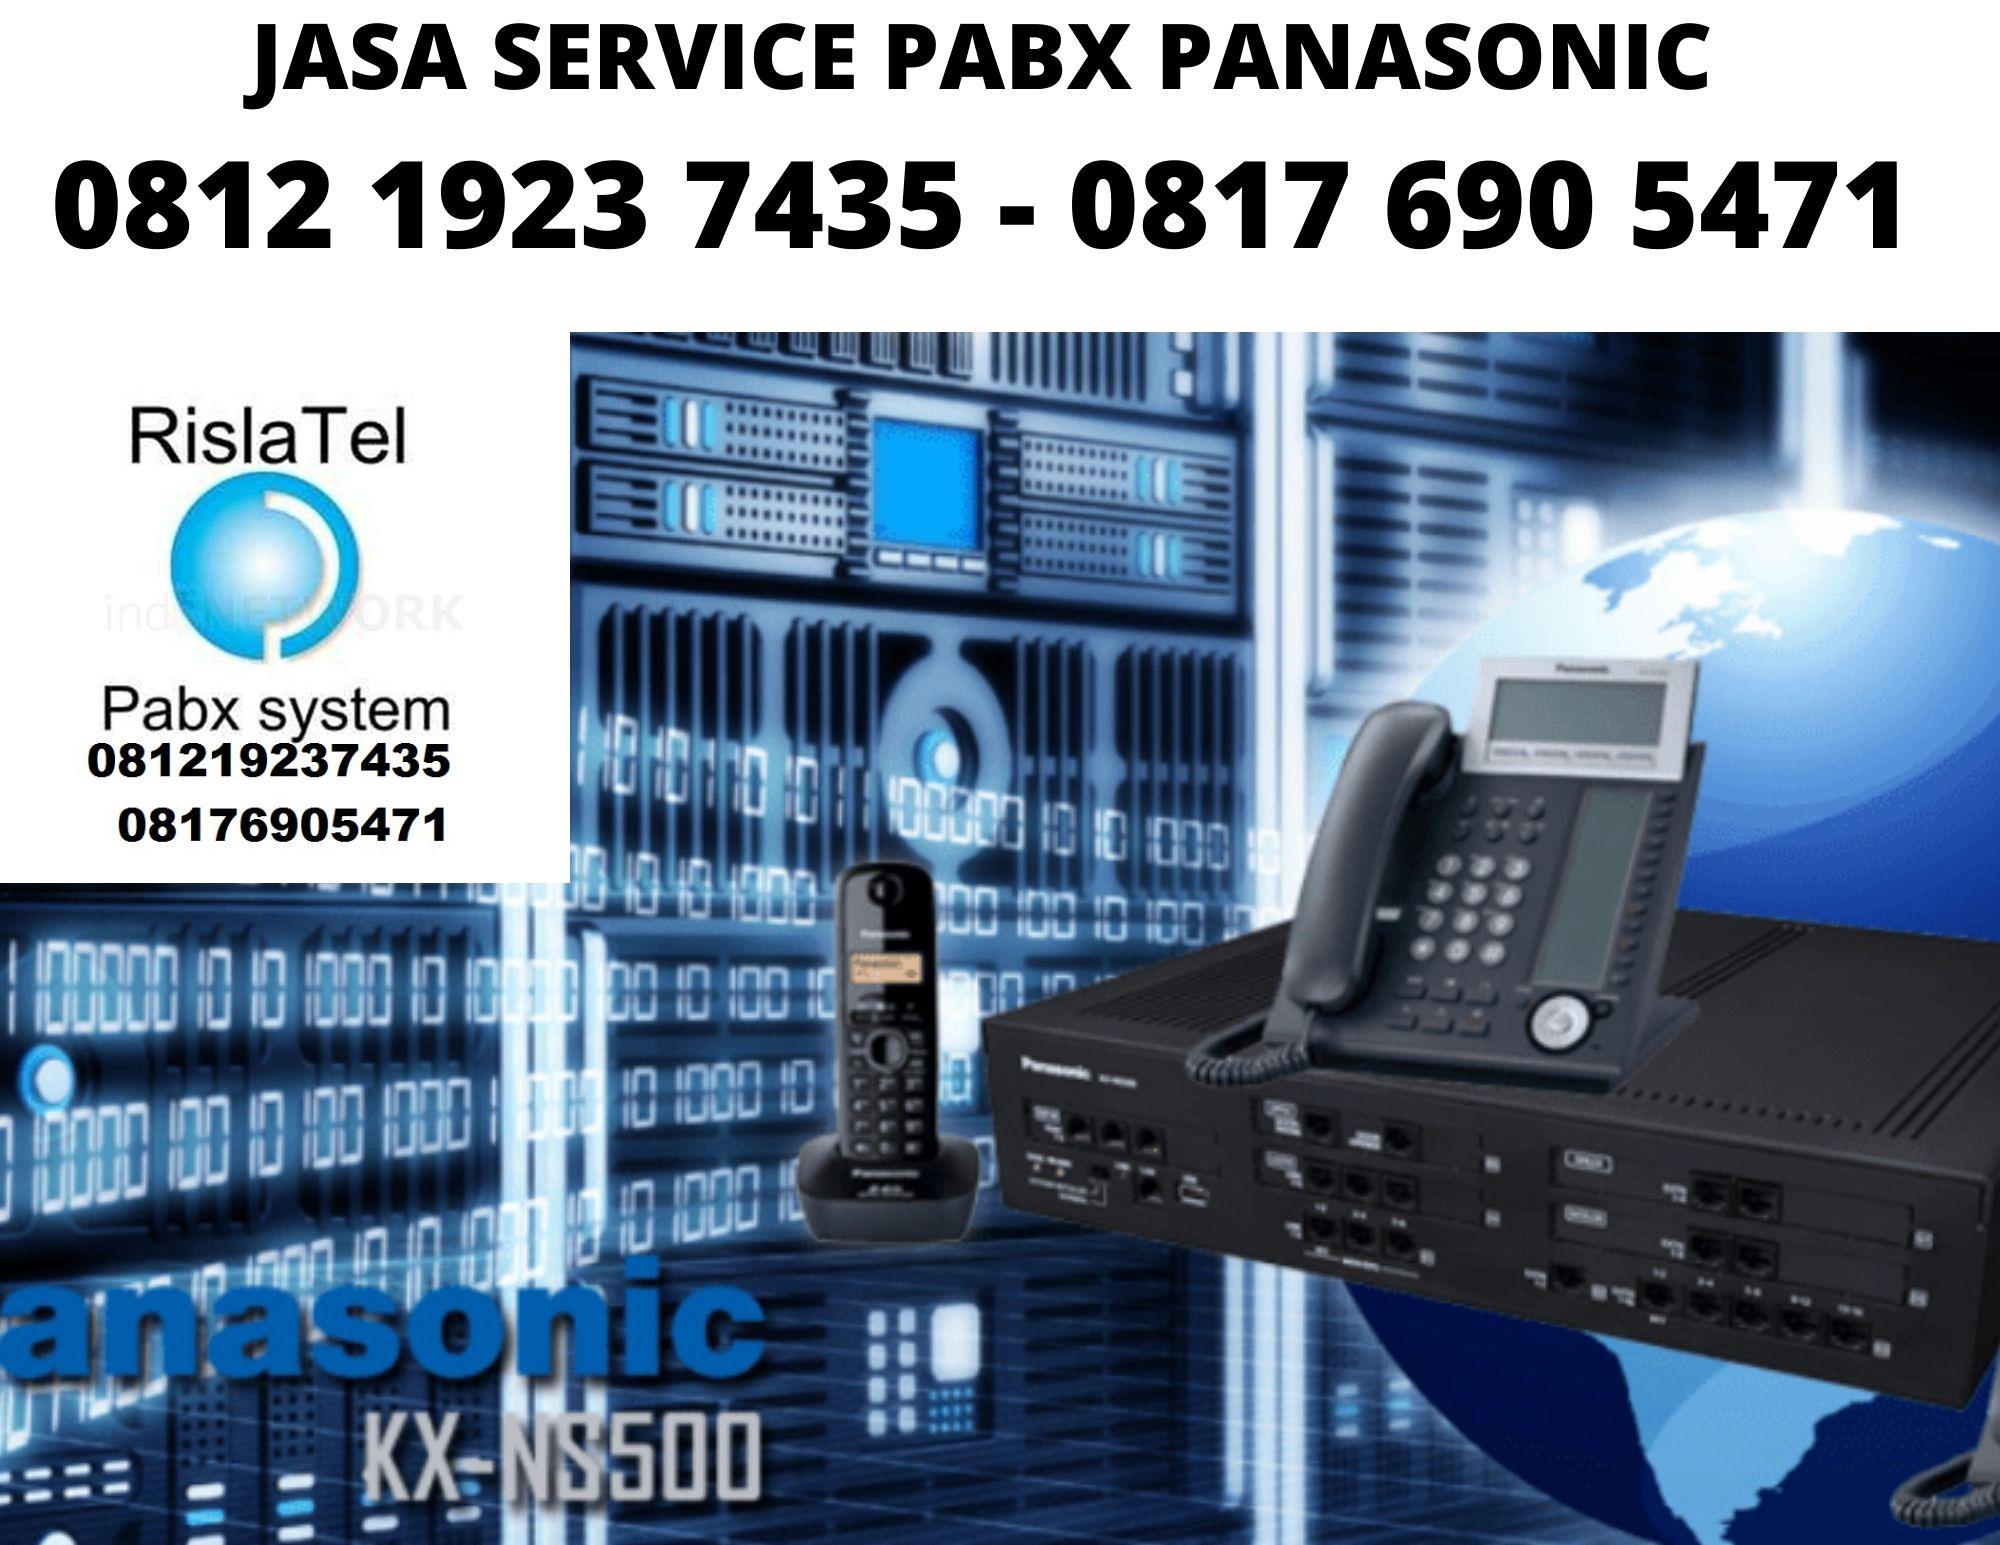 Jasa Service PABX Panasonic